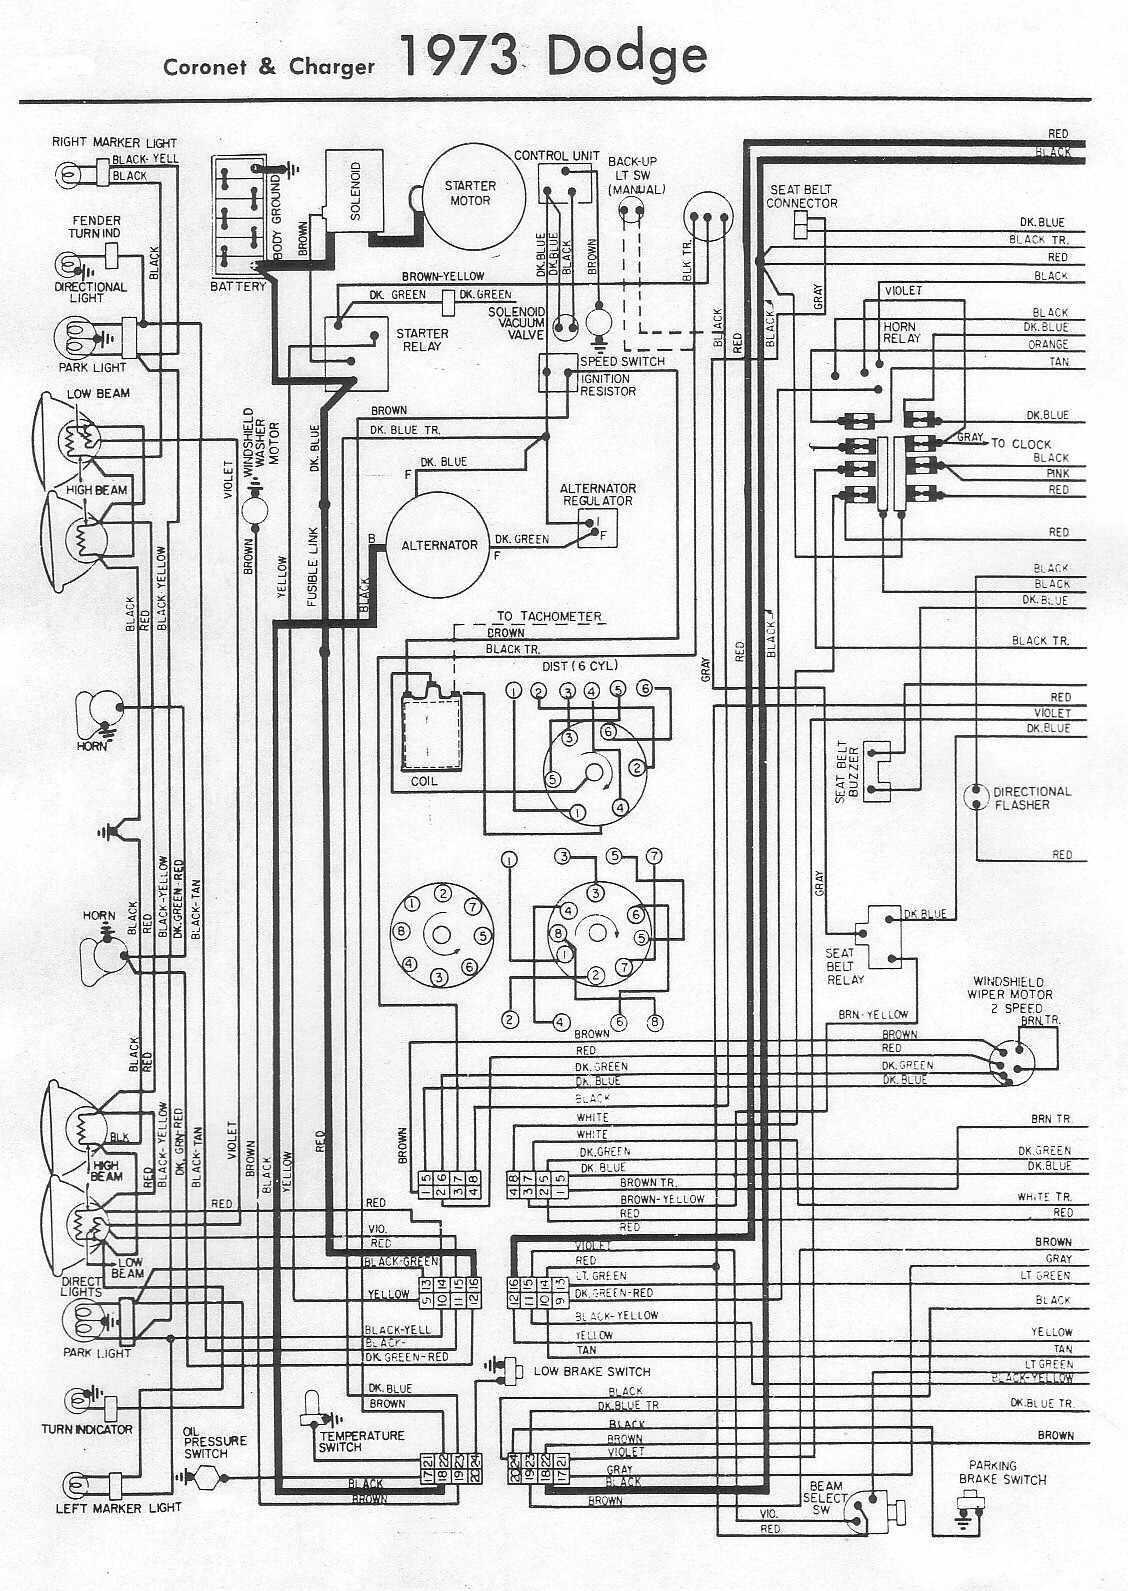 1973 Dodge Charger Fuse Box Diagram Best Wiring Diagrams Www Www Ekoegur Es